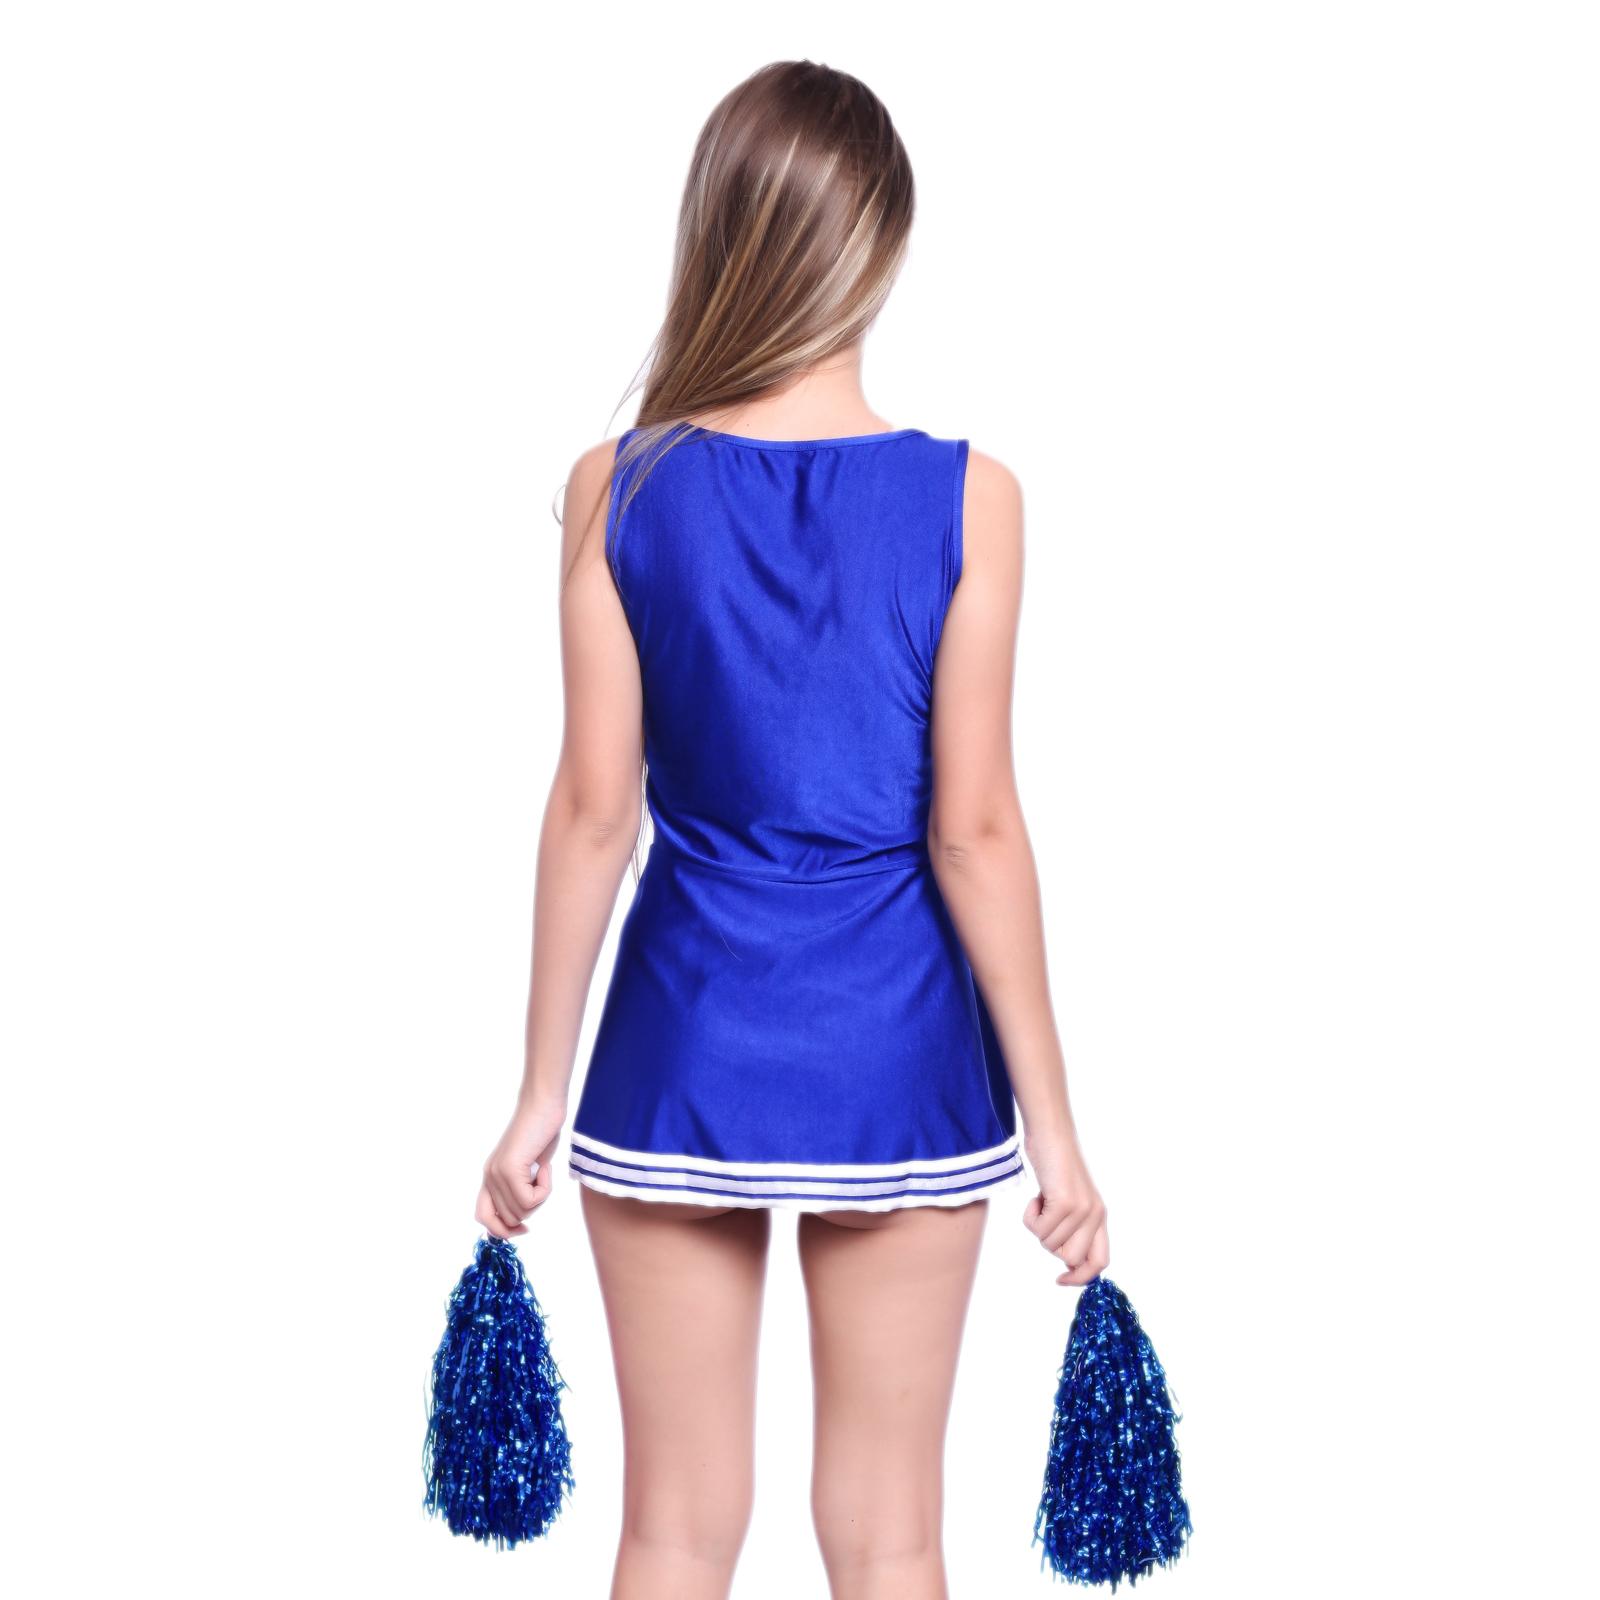 costume cheerleading sports